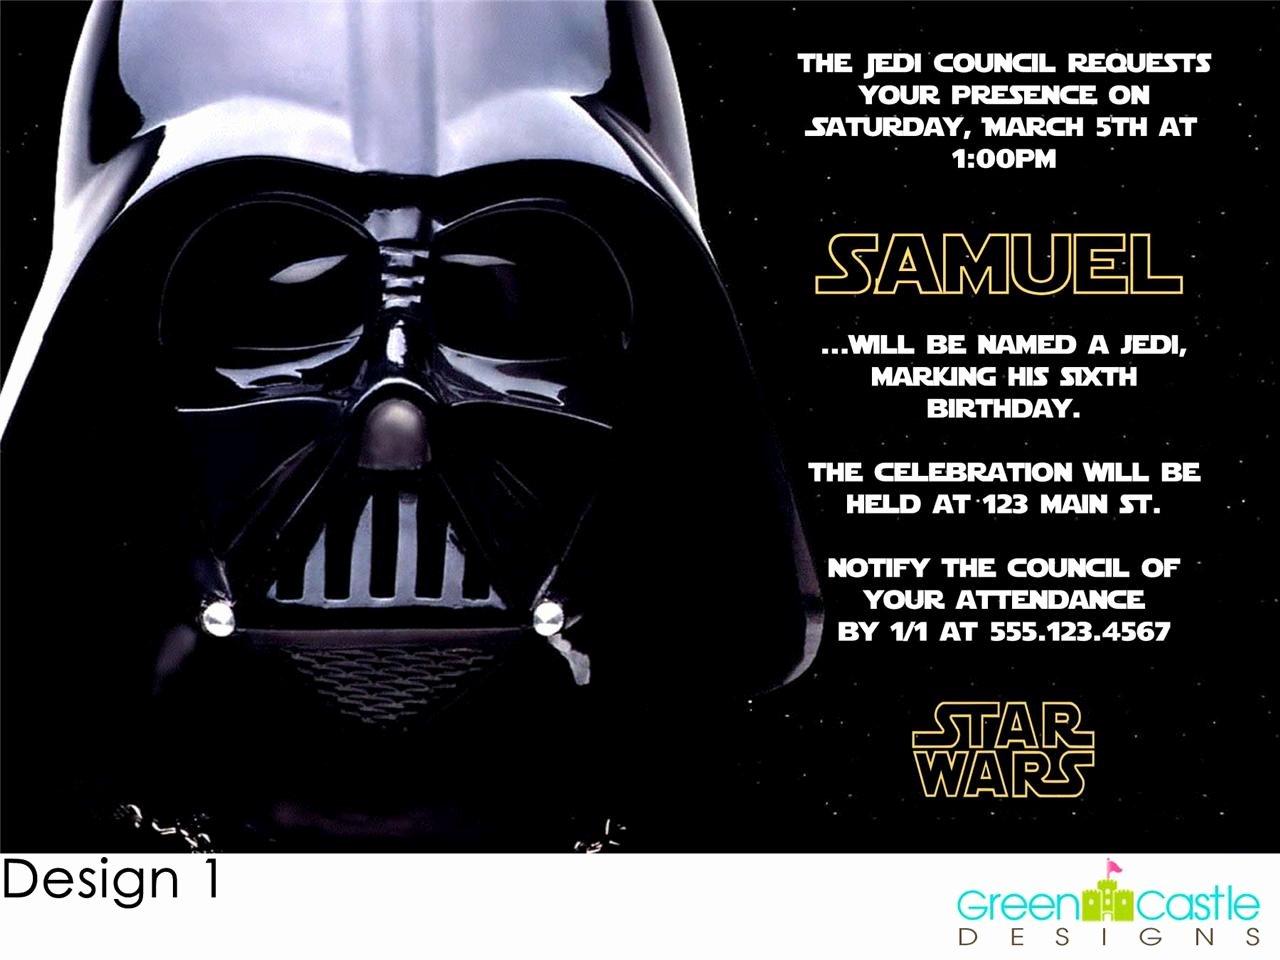 Star Wars Invitations Template Luxury Free Star Wars Birthday Party Invitations Templates